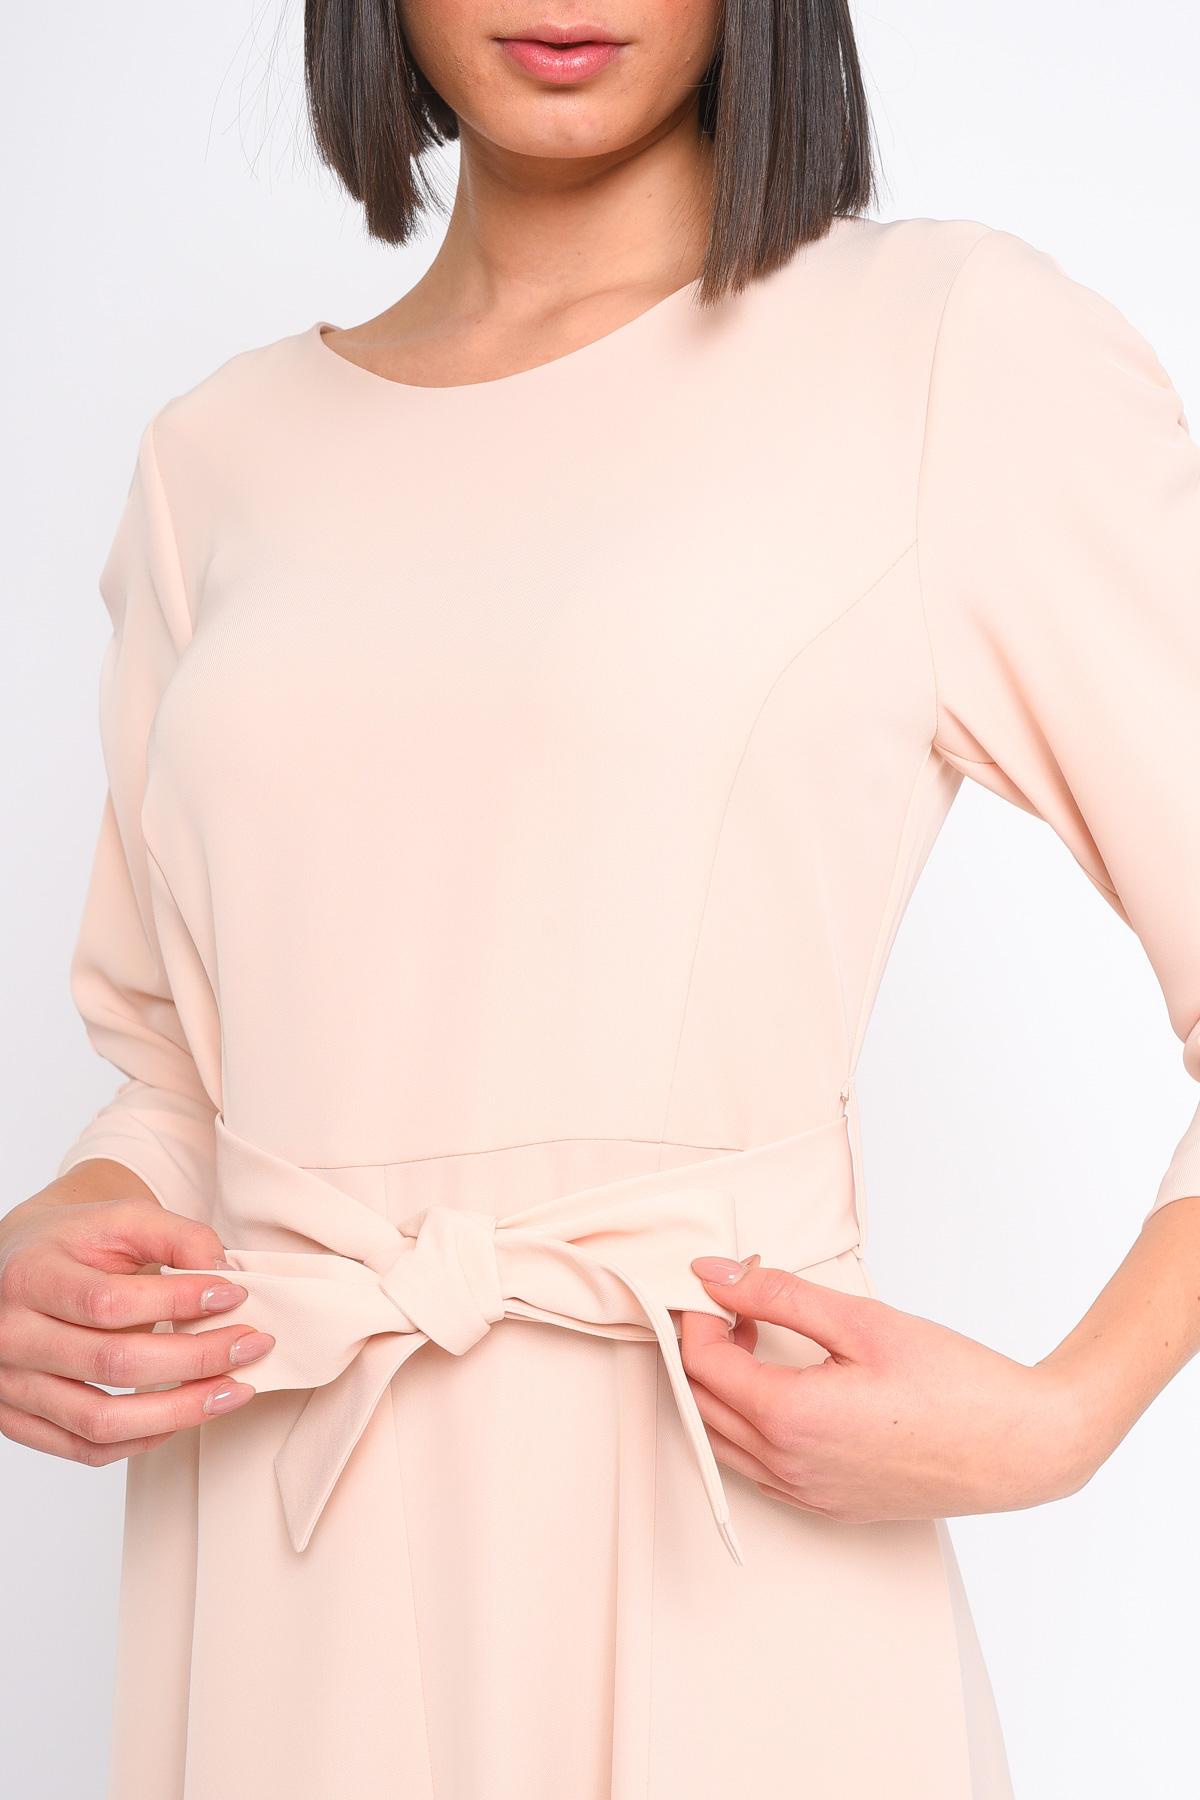 ABITO CON CINTURA for women - POWDER - Paquito Pronto Moda Shop Online